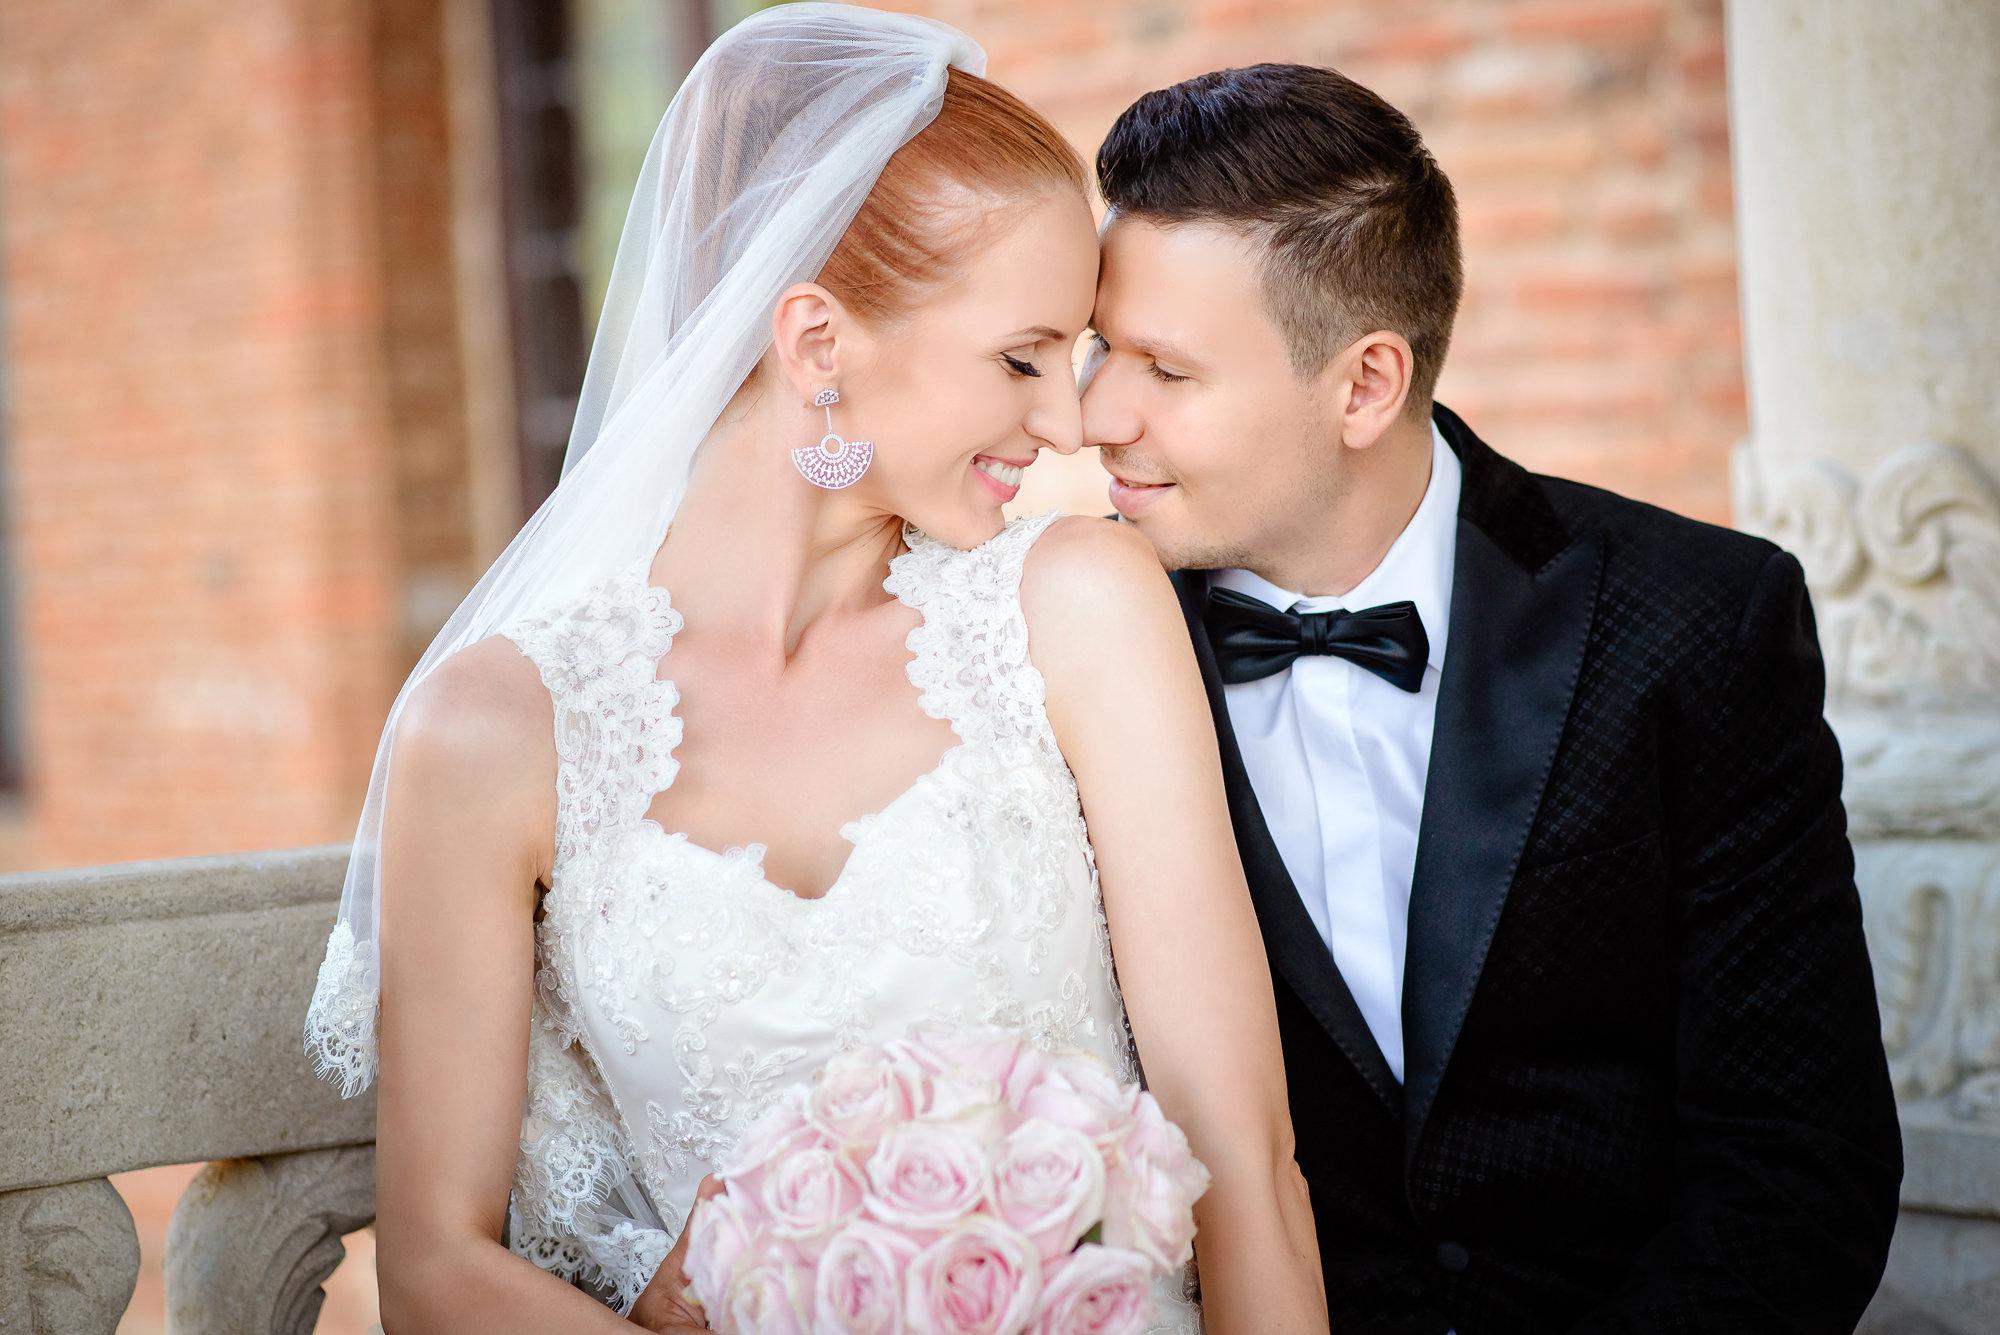 alexandru madalina wedding day 30